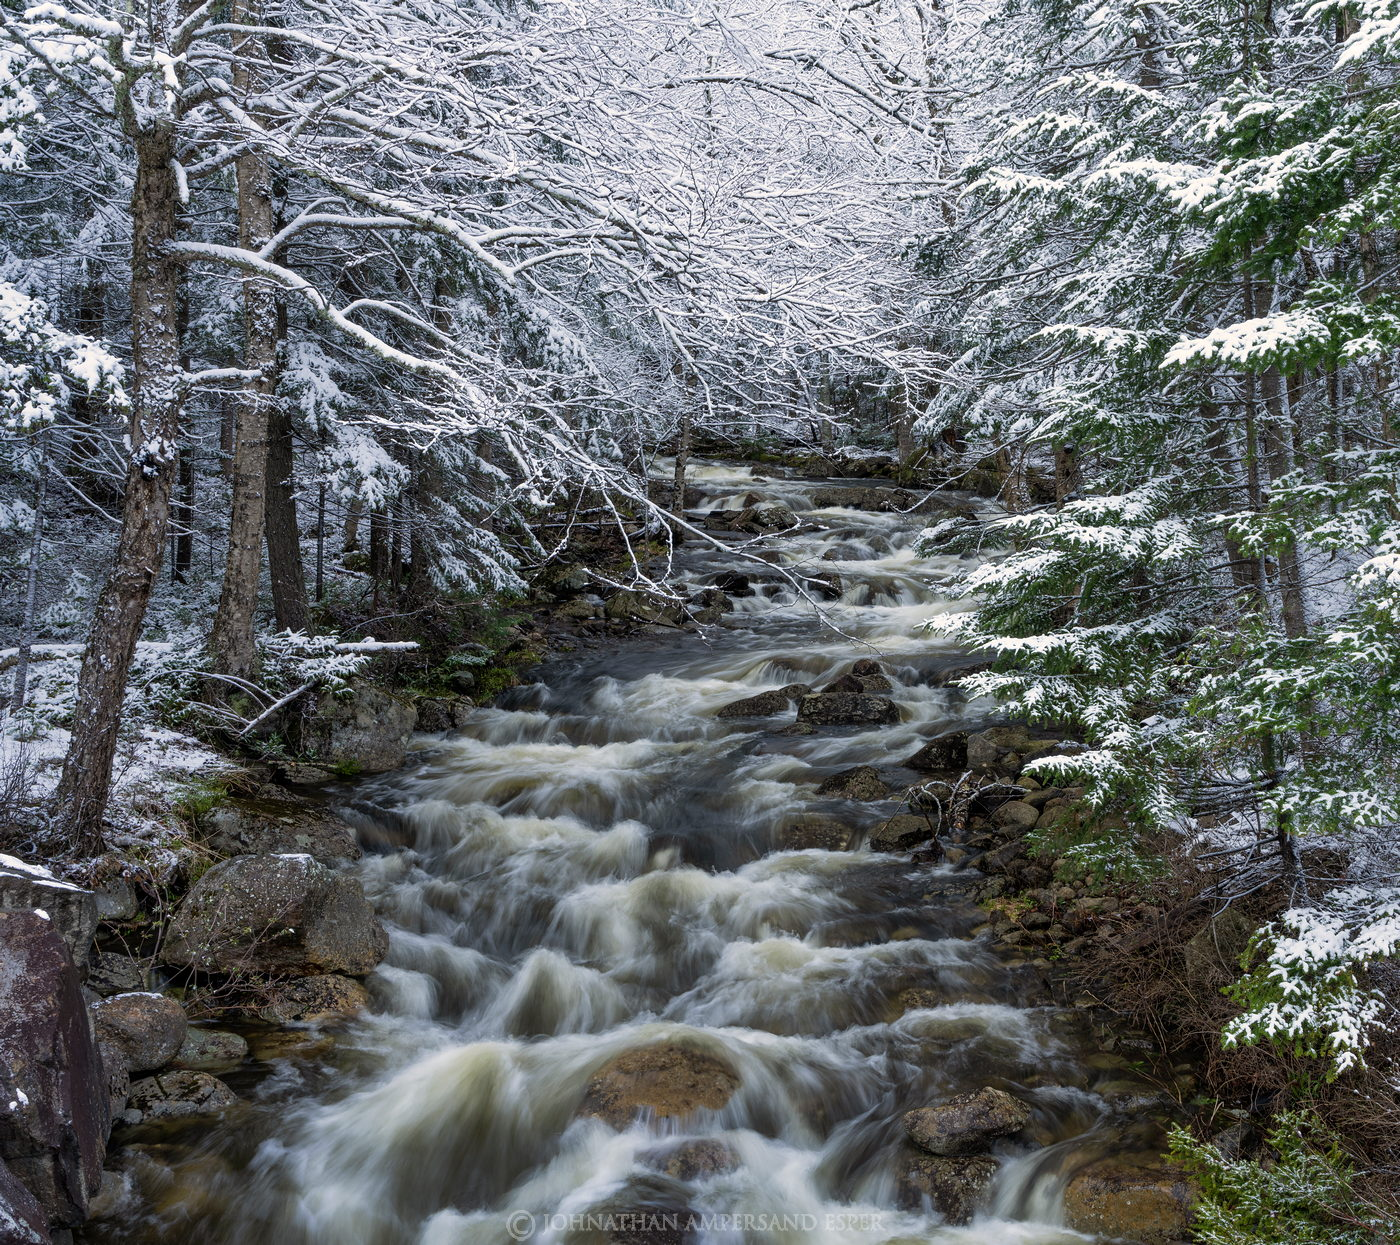 Owen Pond outlet,stream,brook,Wilmington Notch,spring snow,snowfall,snow,white,2021